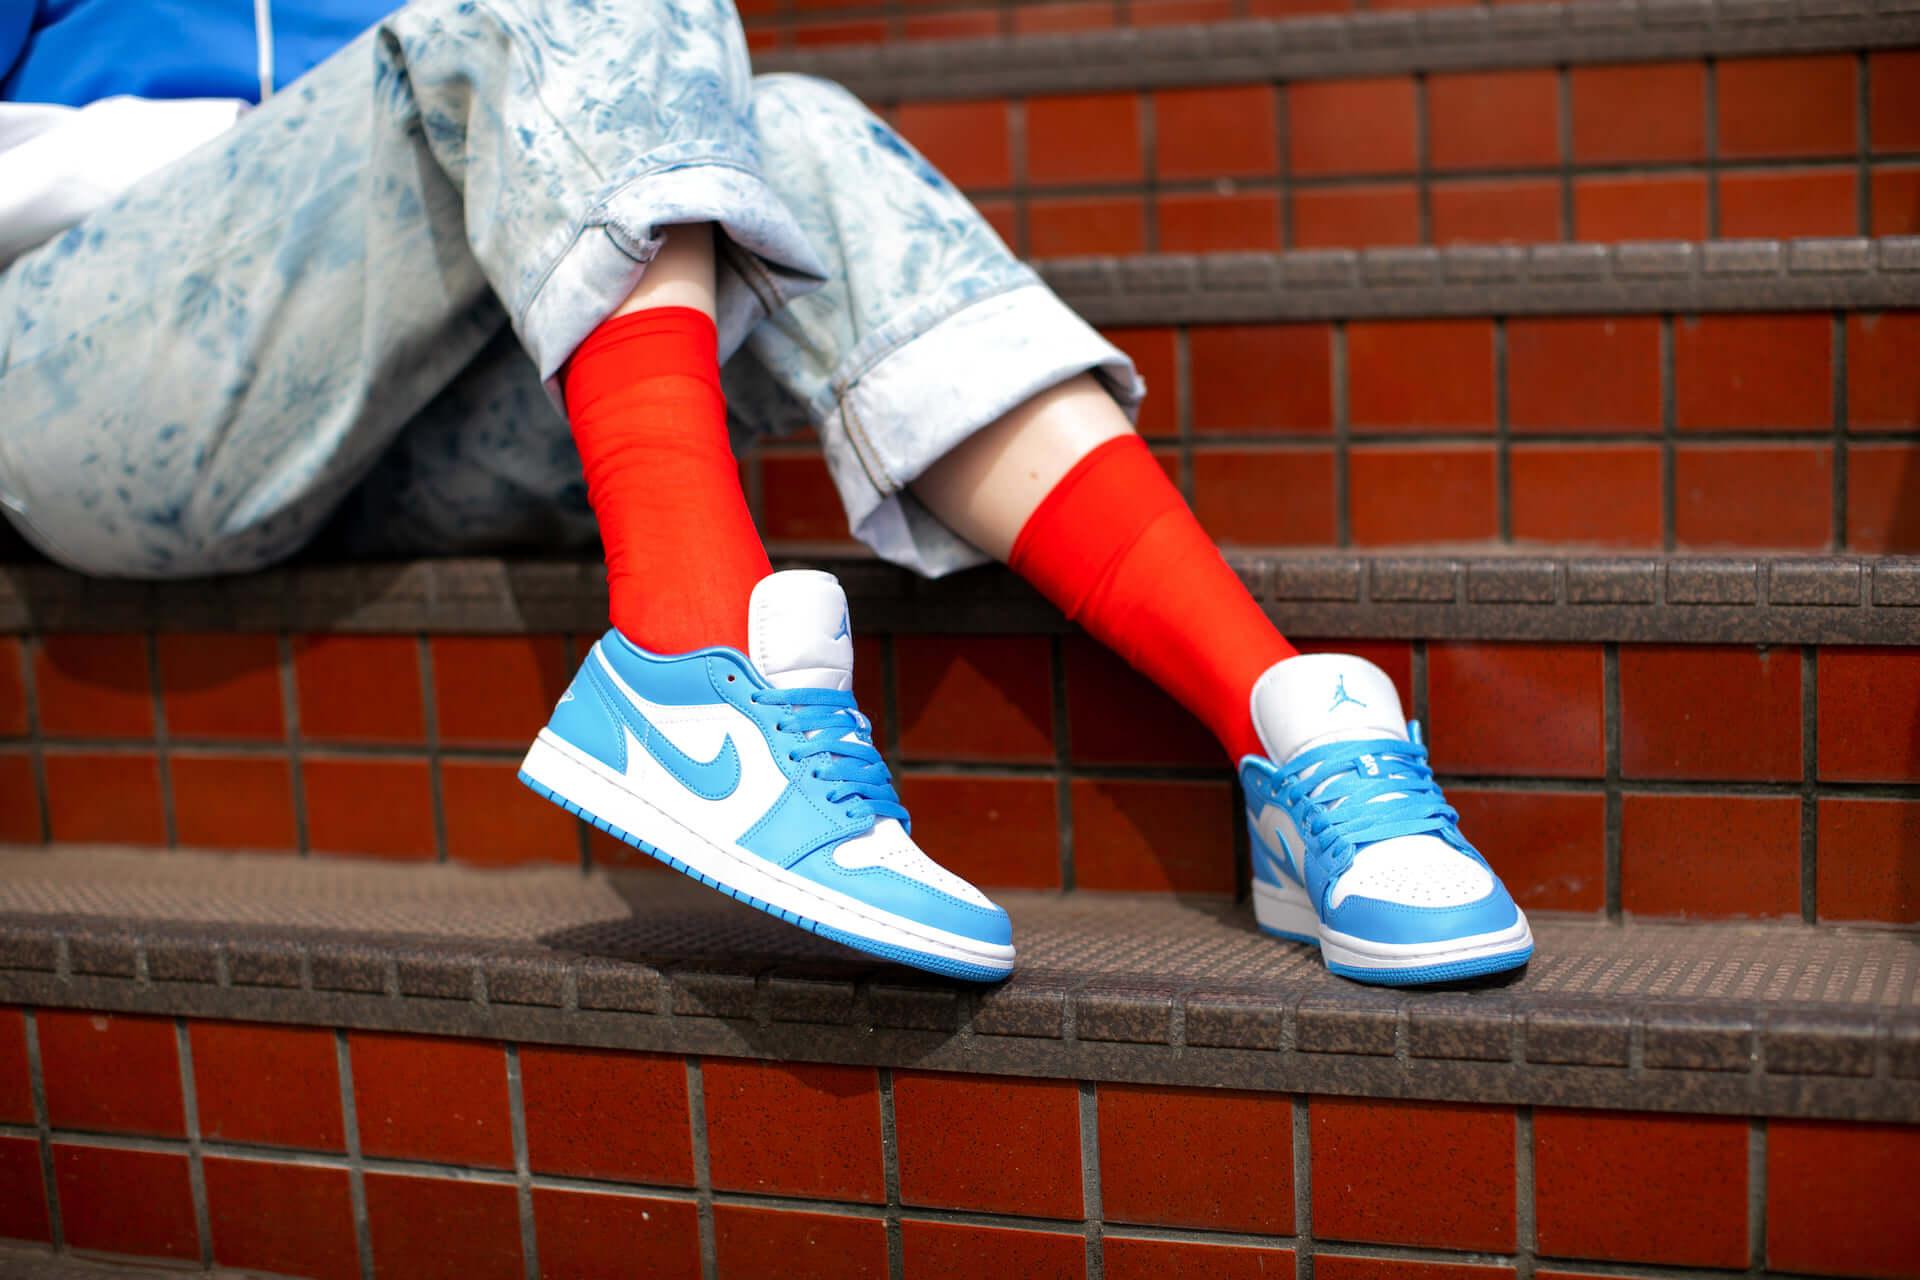 NIKE『Air Jordan 1』のウィメンズモデルがatmos pinkより登場!マイケル・ジョーダンの母校のカレッジカラー・スニーカー life200330_airjordan_womens_13-1920x1280